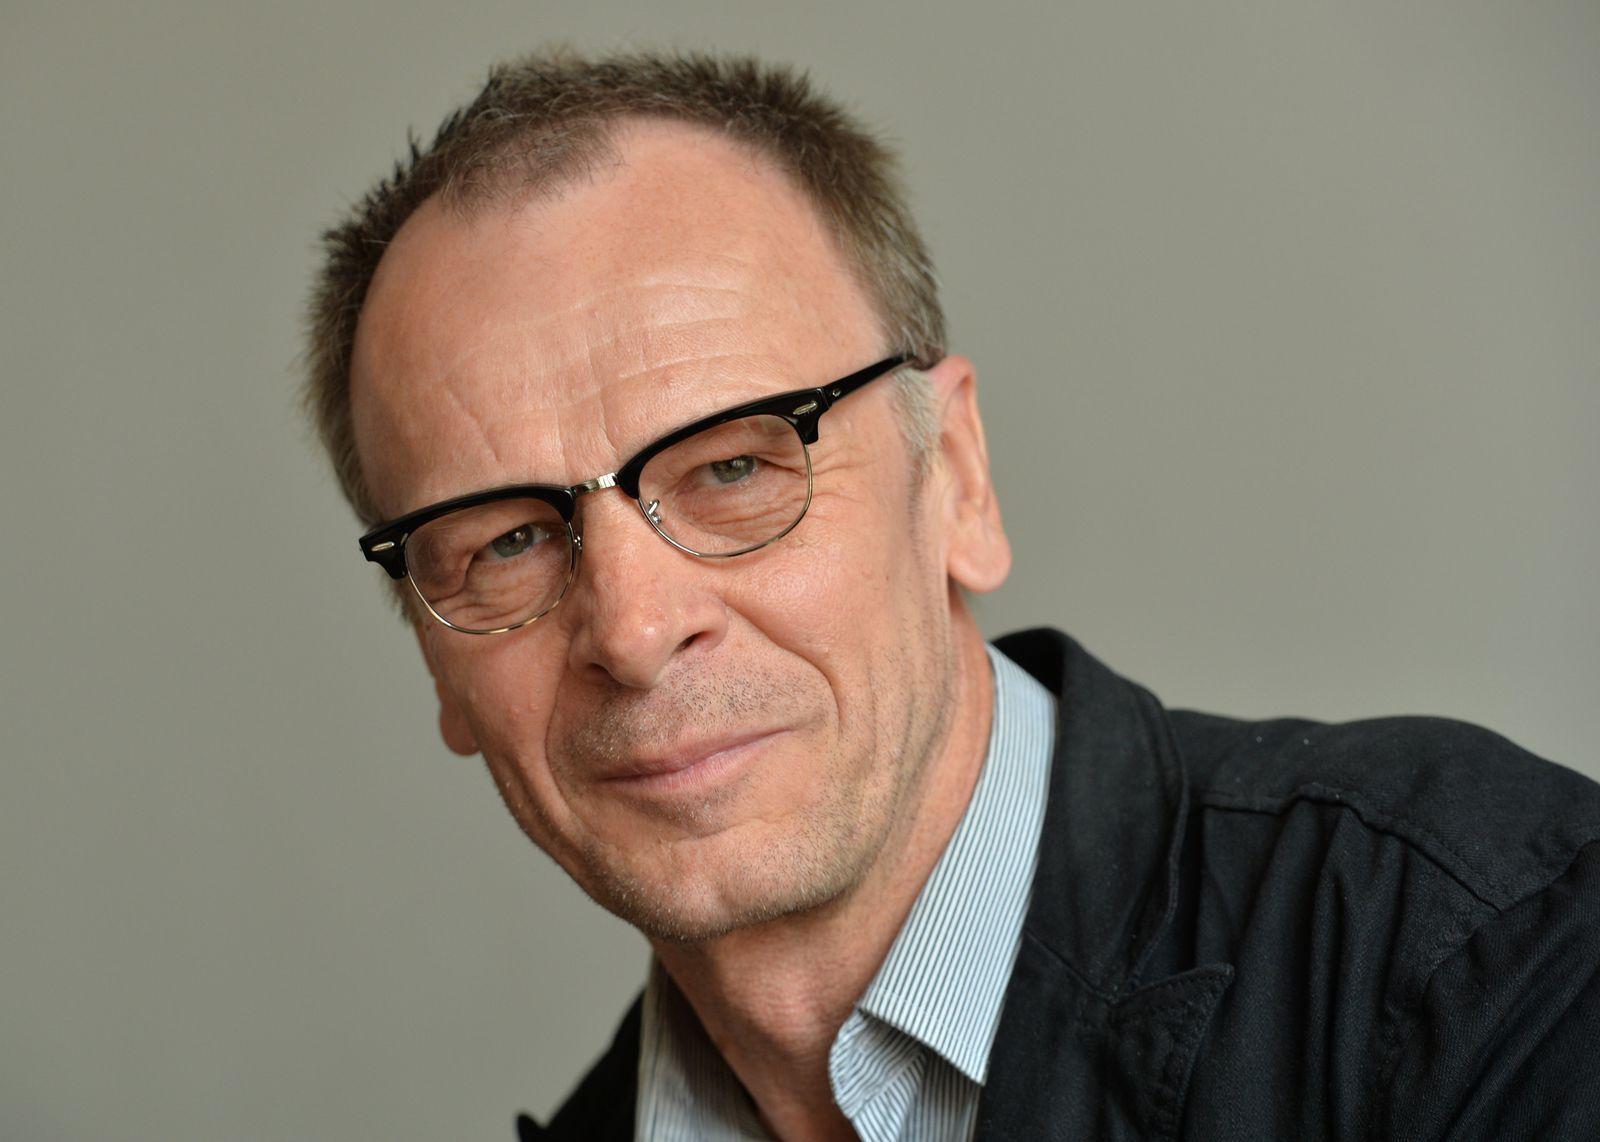 Josef Haslinger